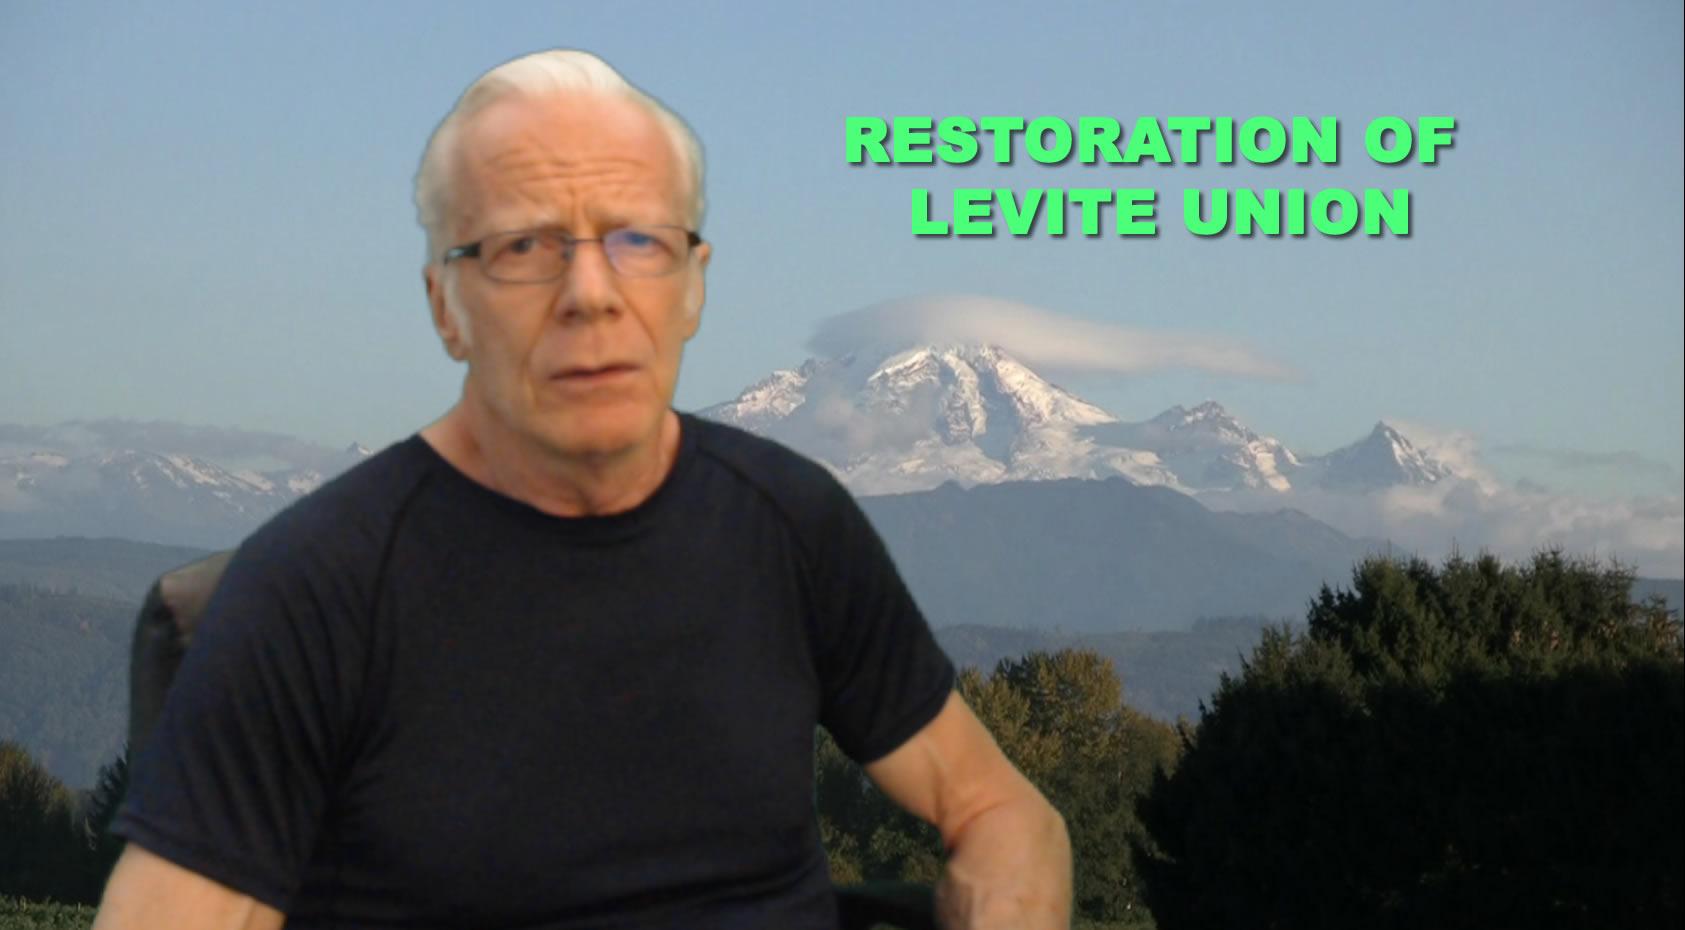 Restoration of Levite Union